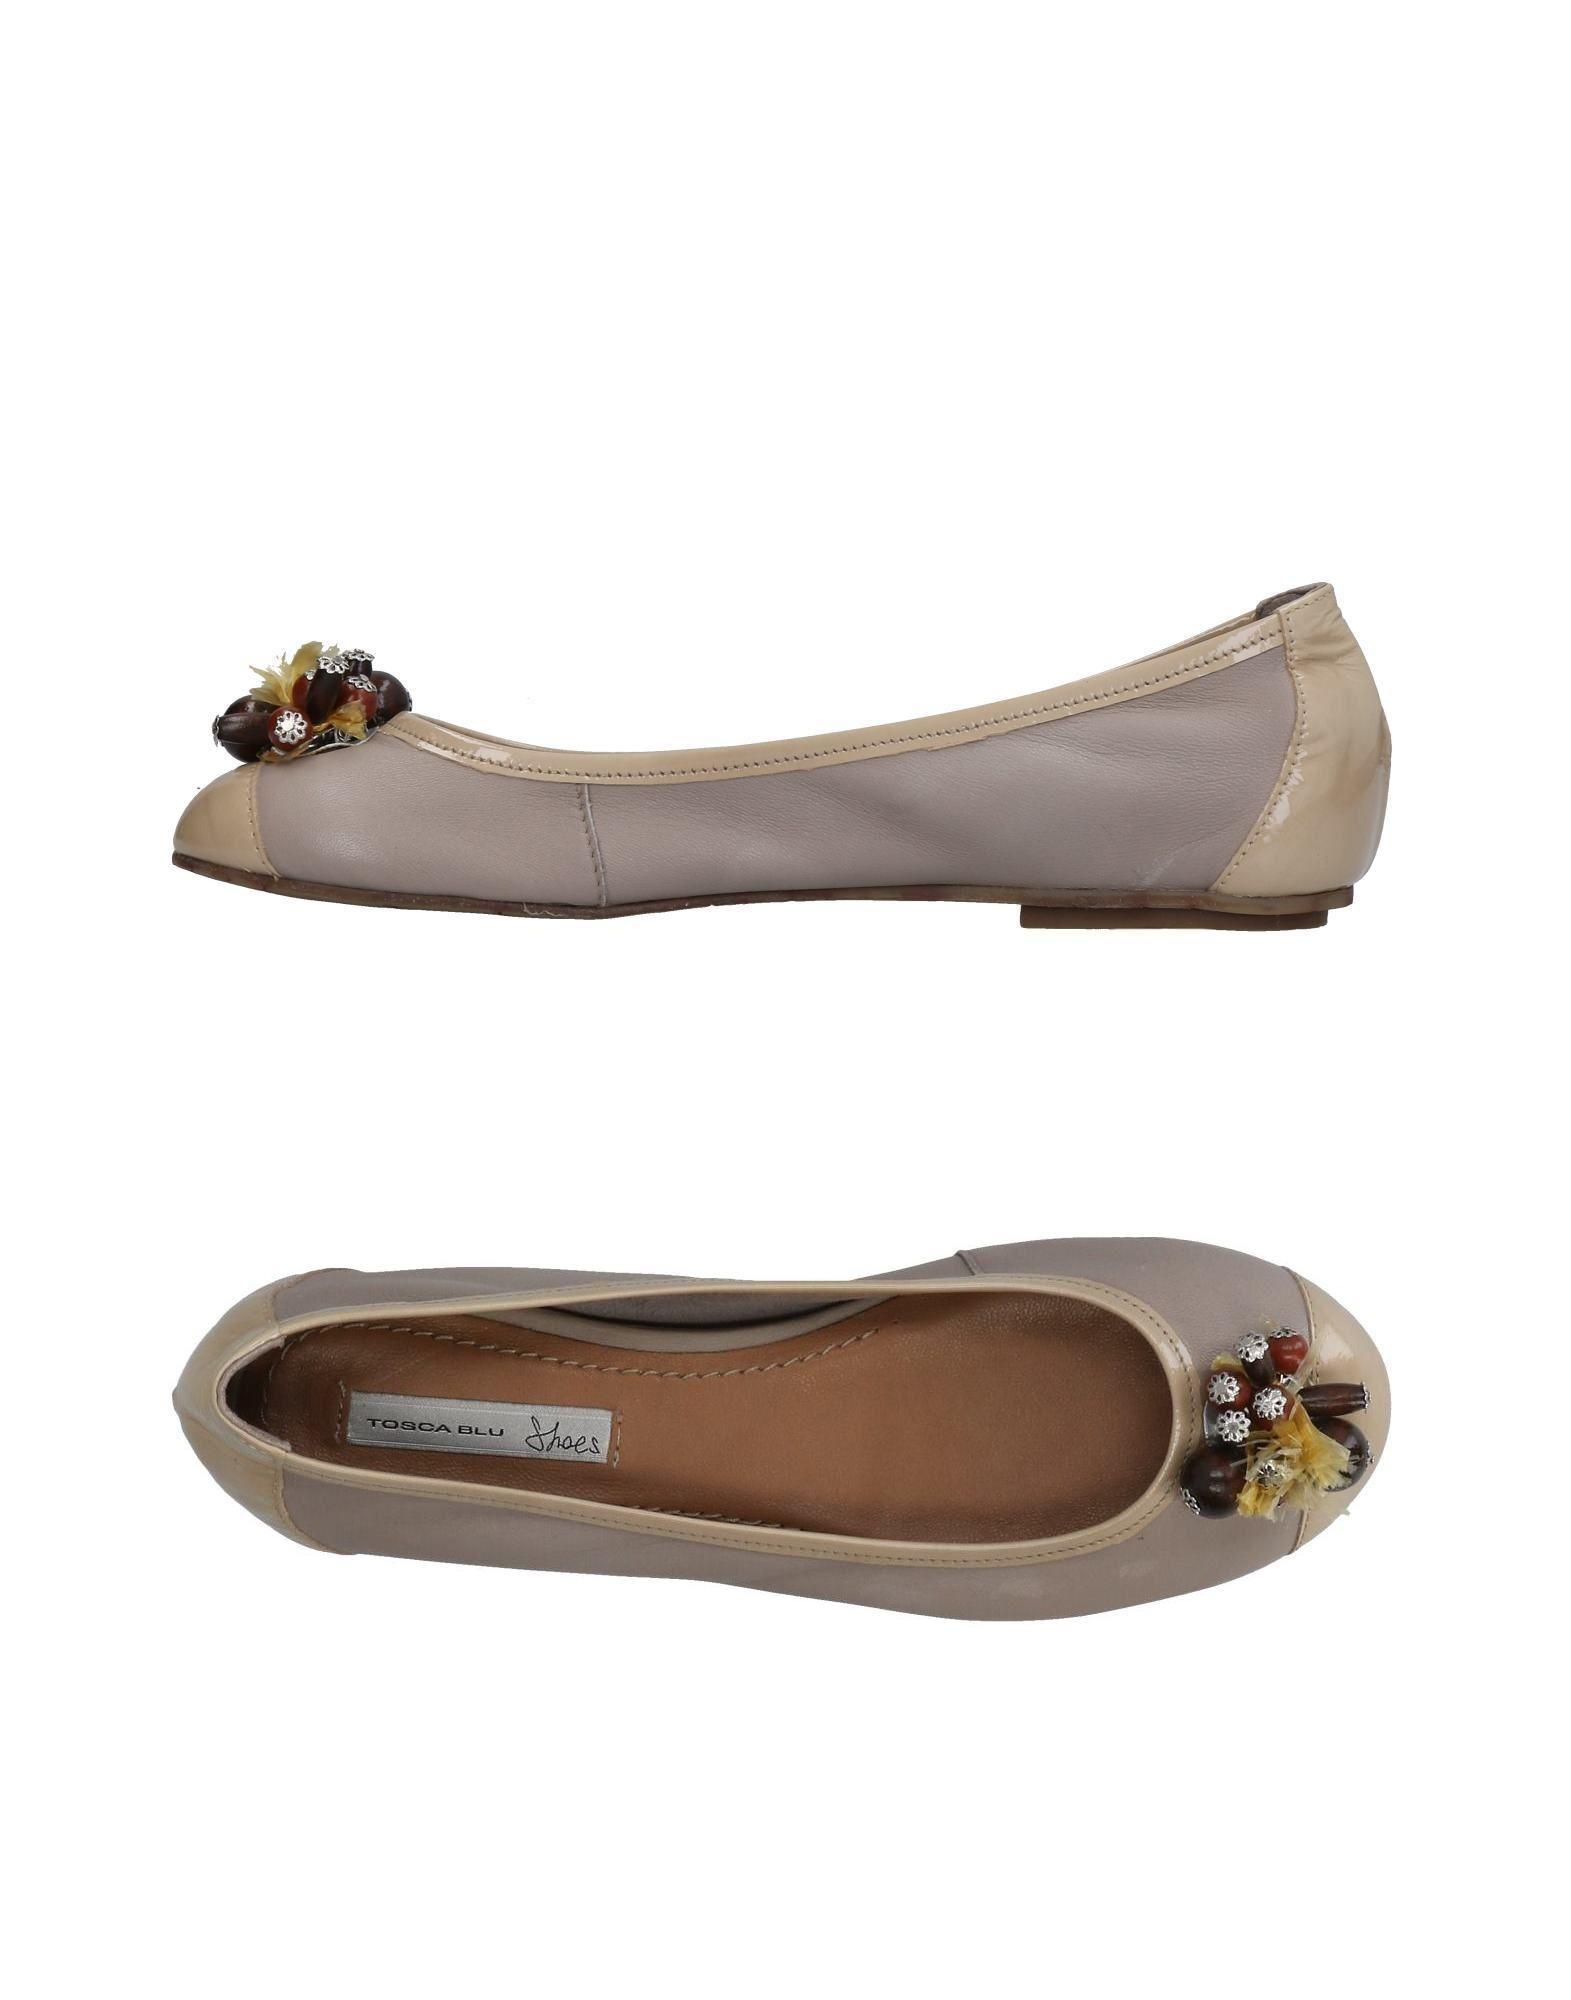 Chaussures - Sandales Post Orteil Tosca Blu NftRTFIQJ